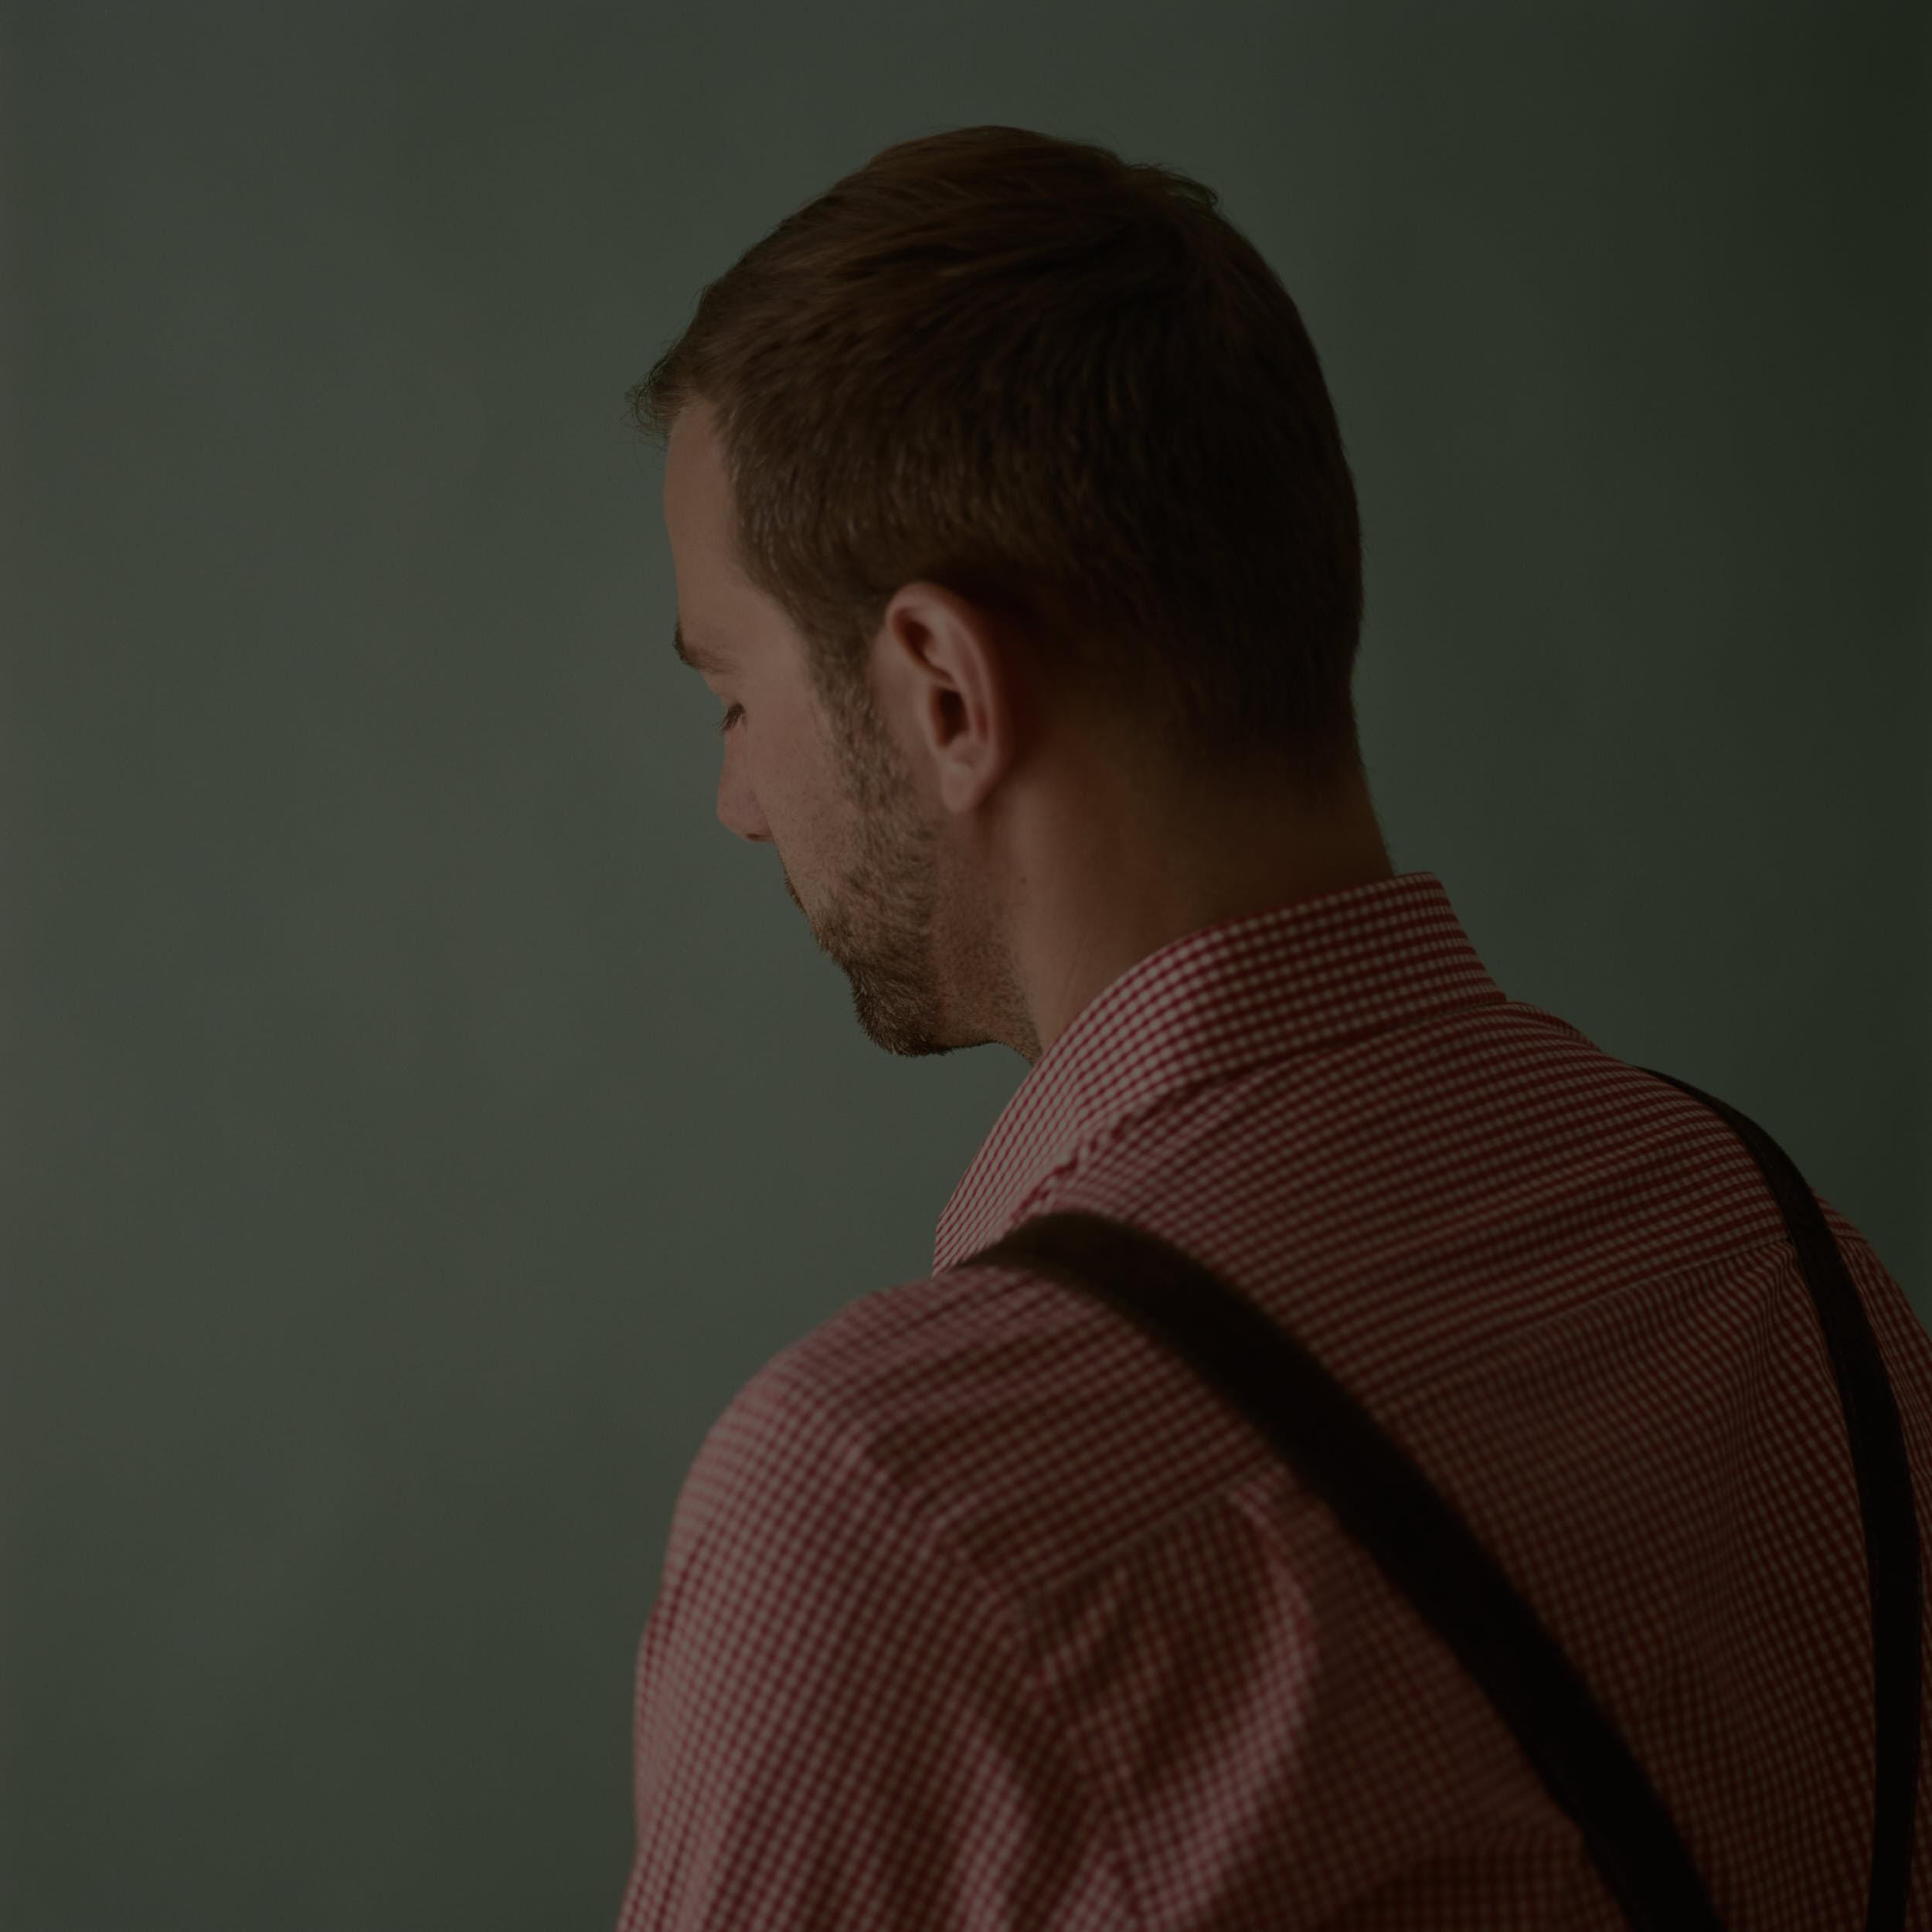 Moody medium format portrait of an austrian man in a traditional wardrobe.